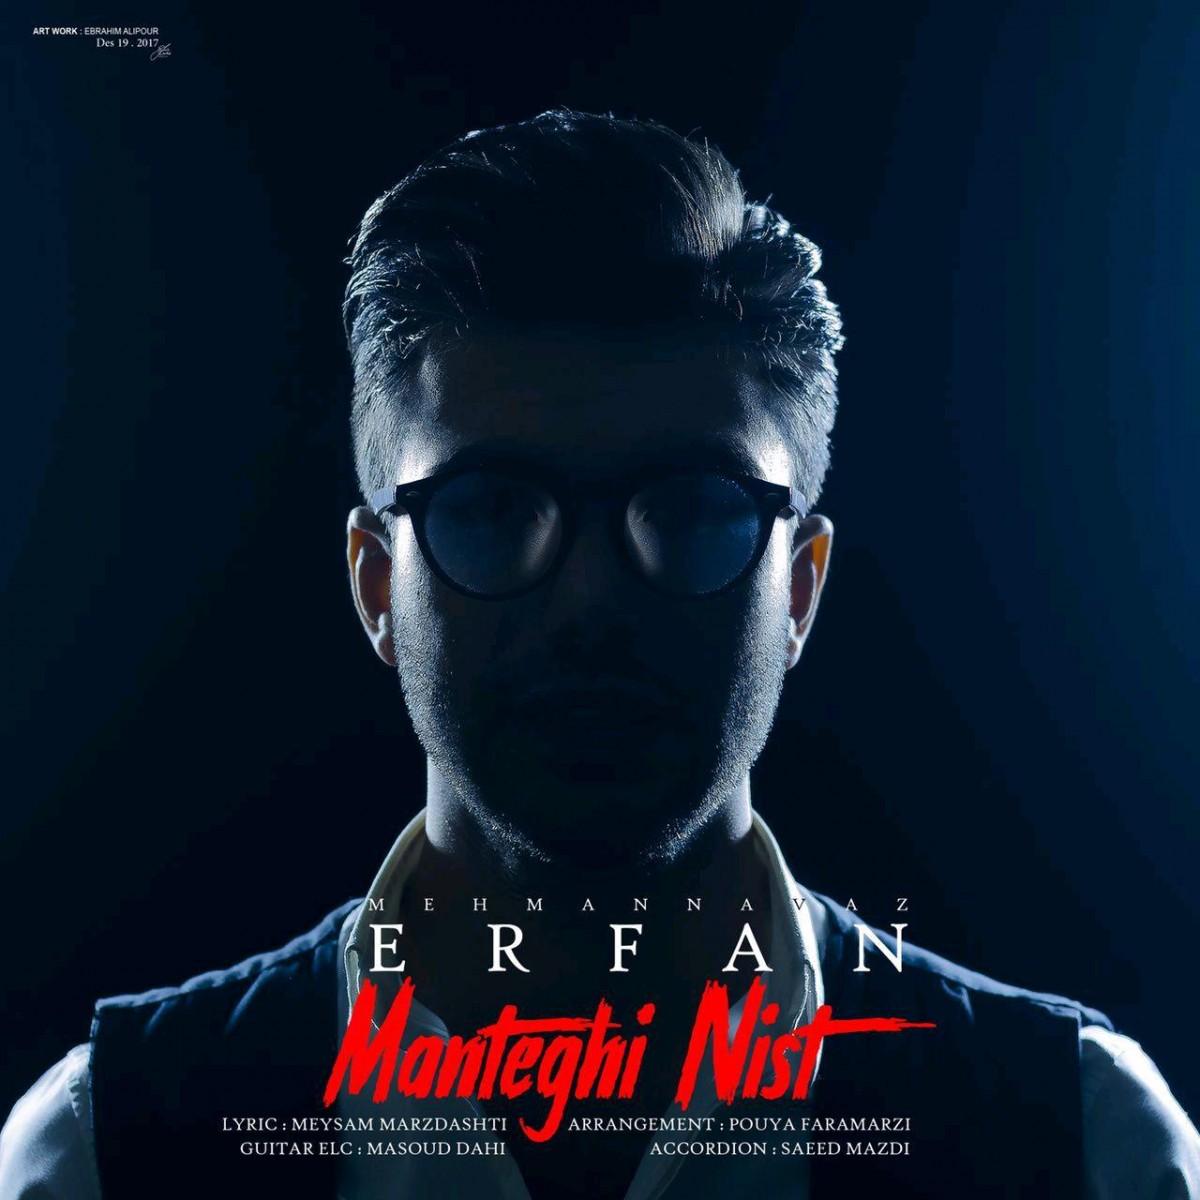 نامبر وان موزیک | دانلود آهنگ جدید Erfan-Mehmannavaz-Manteghi-Nist